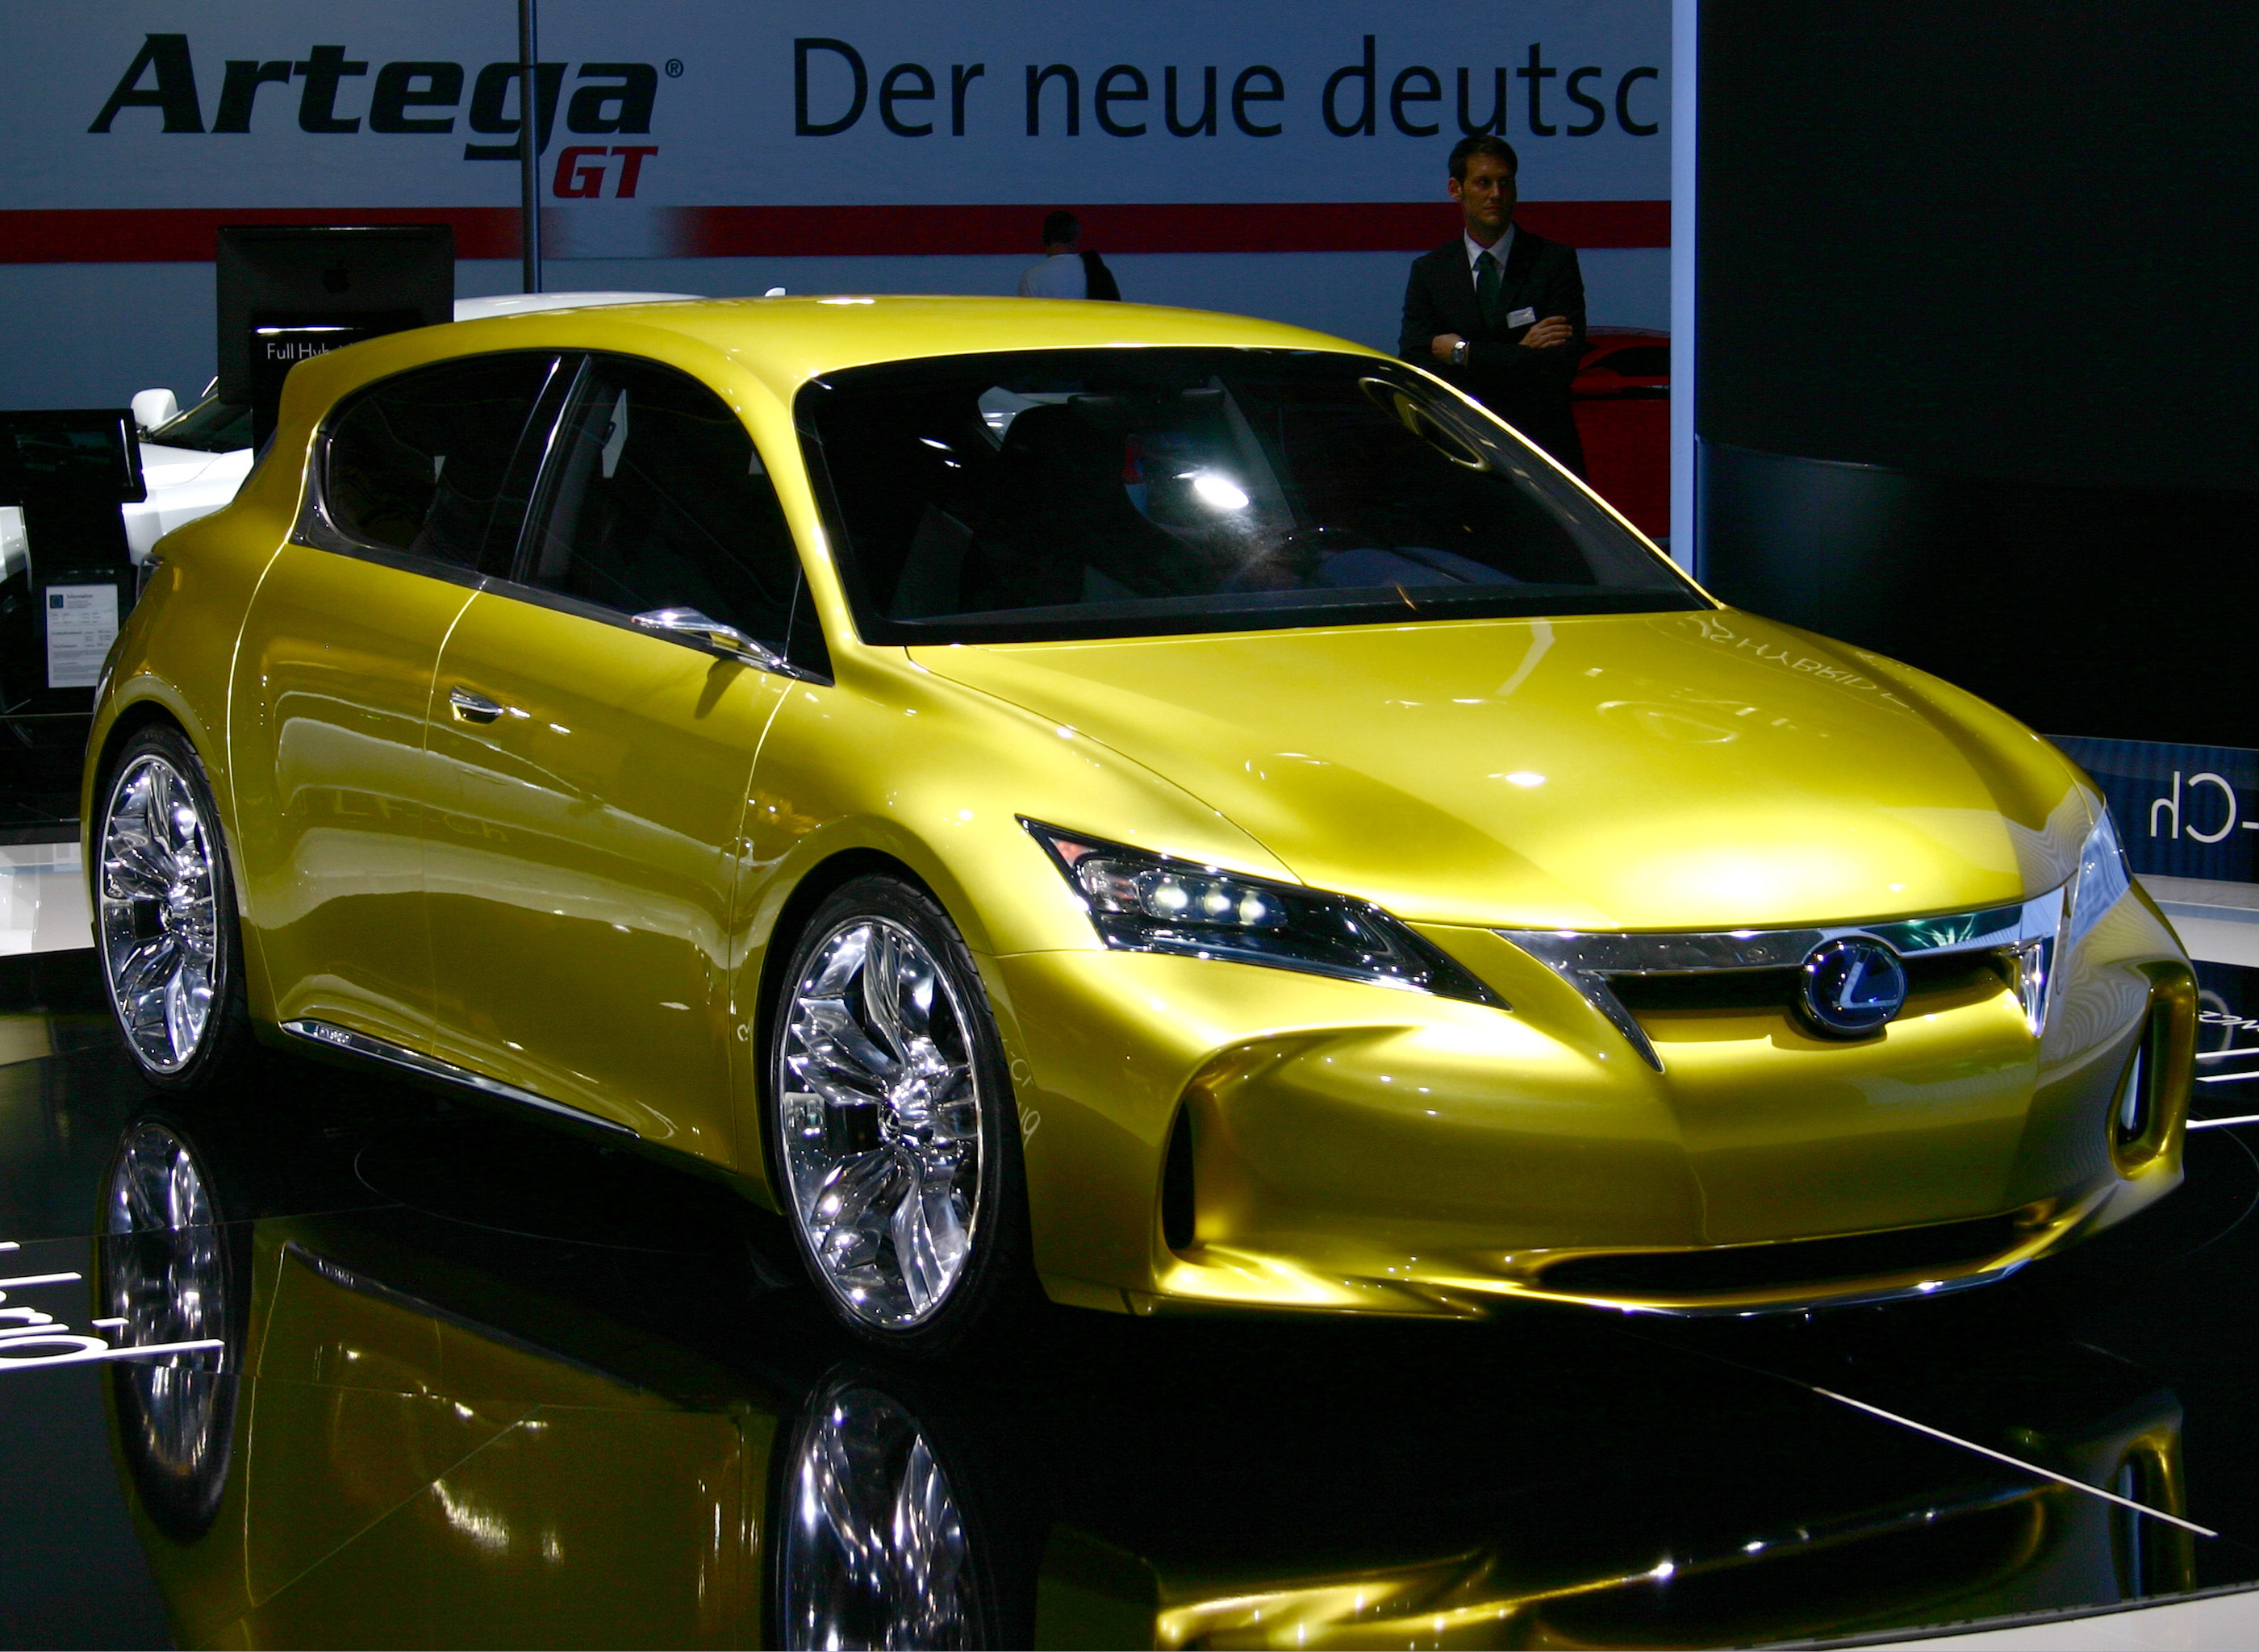 https://upload.wikimedia.org/wikipedia/commons/3/33/Lexus_LF-Ch_Hybrid_Concept_IAA_2009.jpg